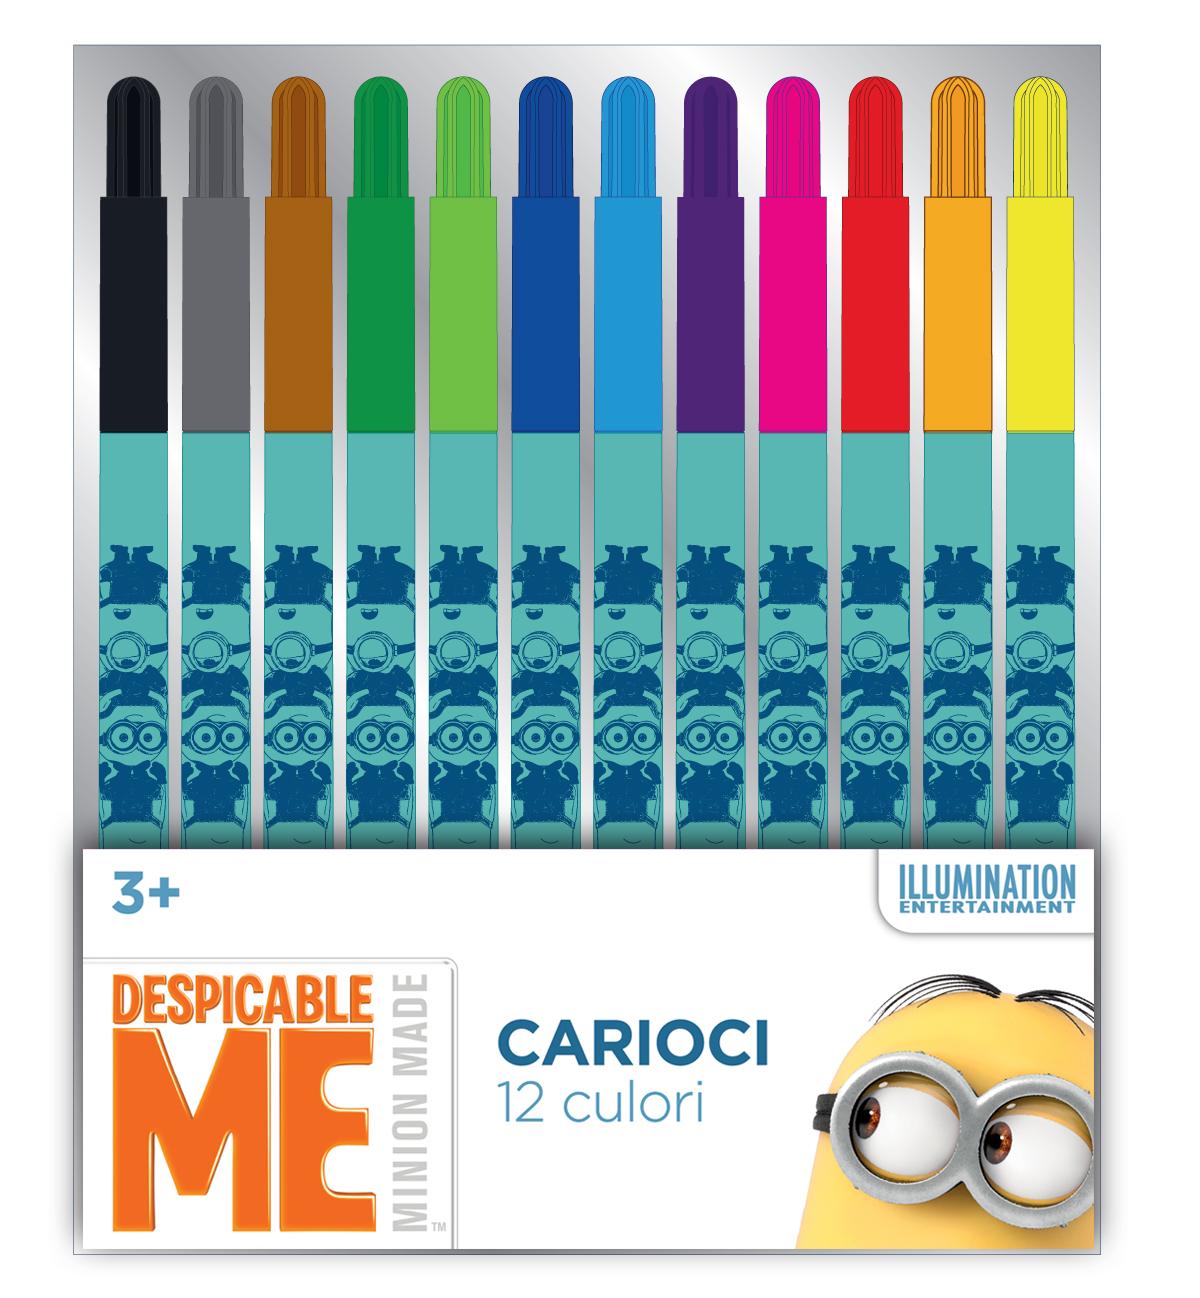 Carioci 12 culori/set MINIONS